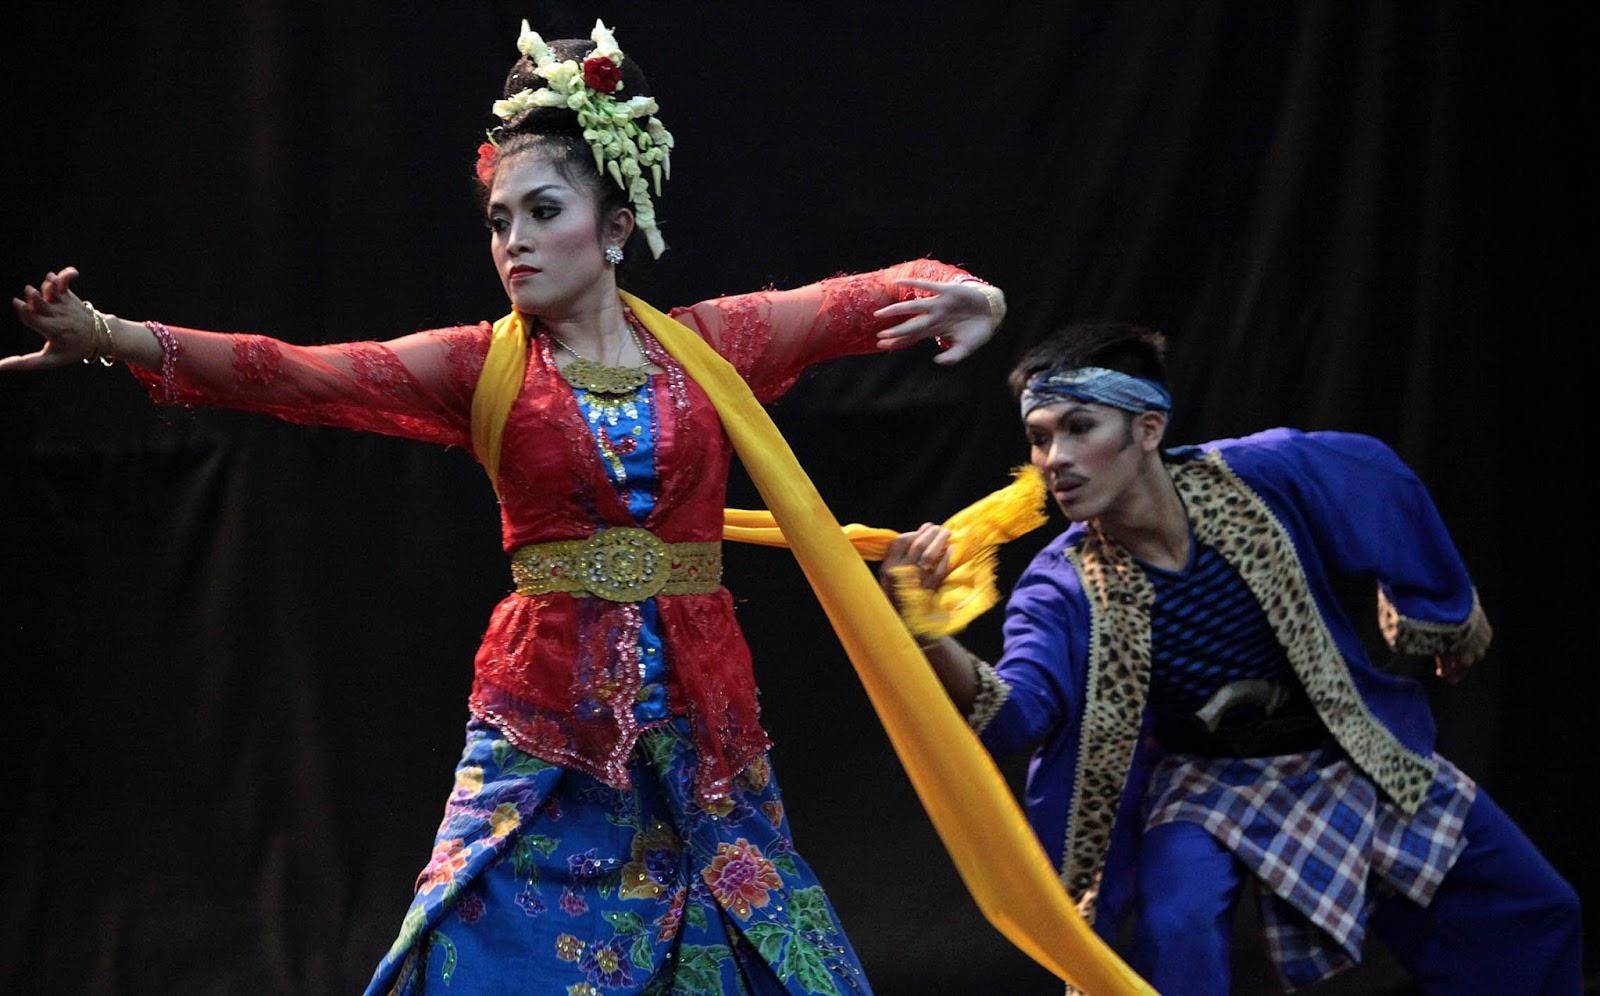 Tari Jaipong dari Jawa Barat Tradisi Tradisional